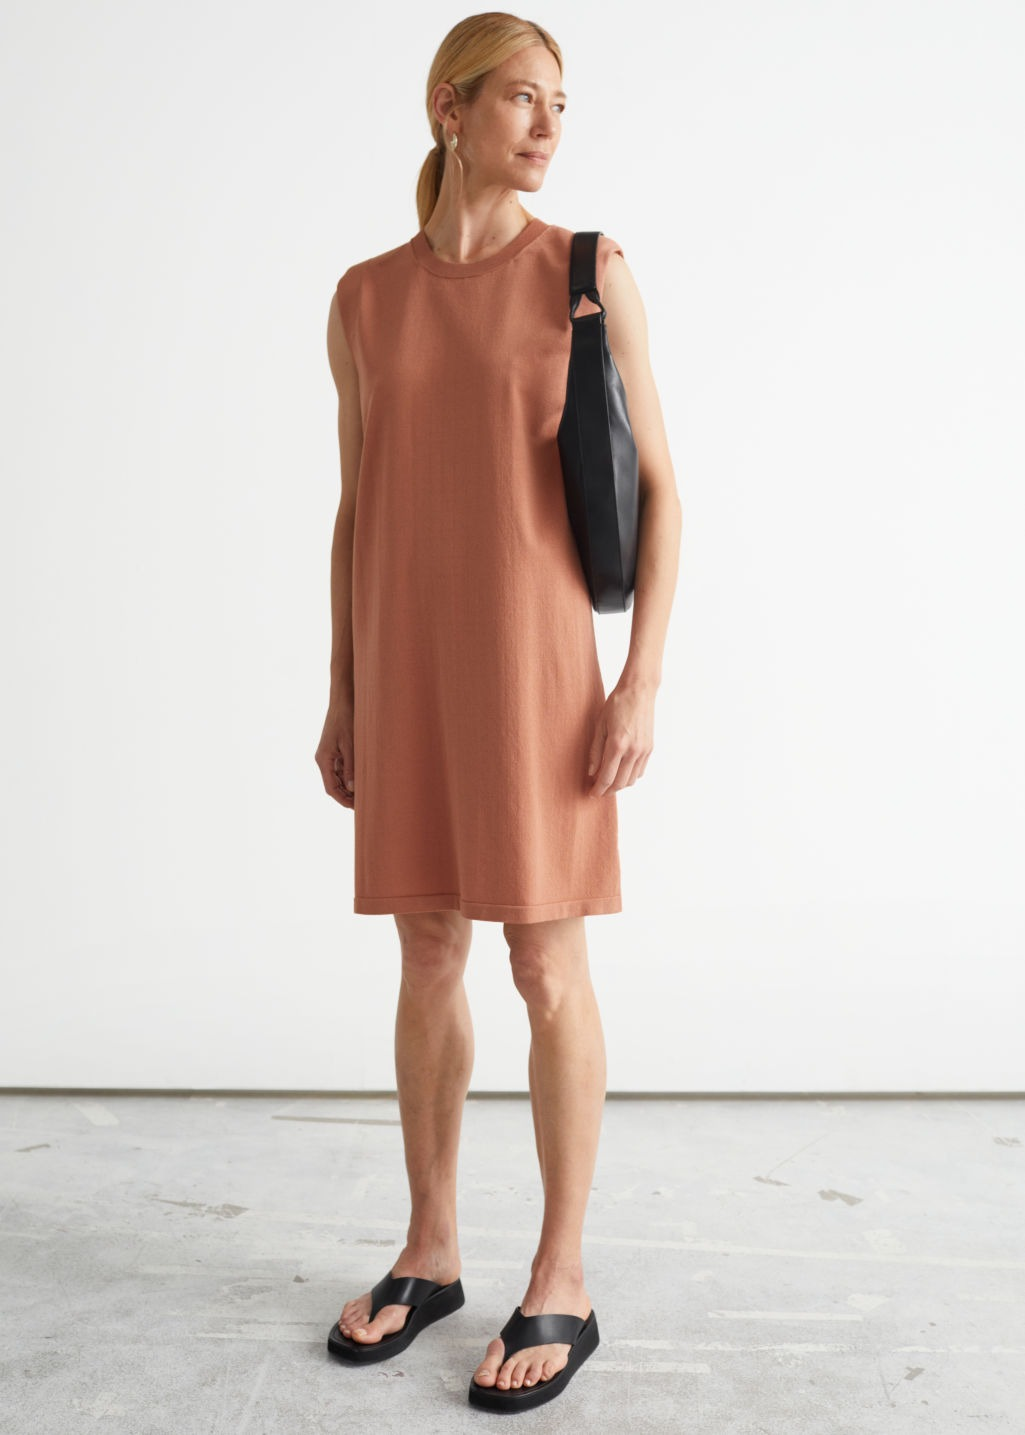 Terracotta dress